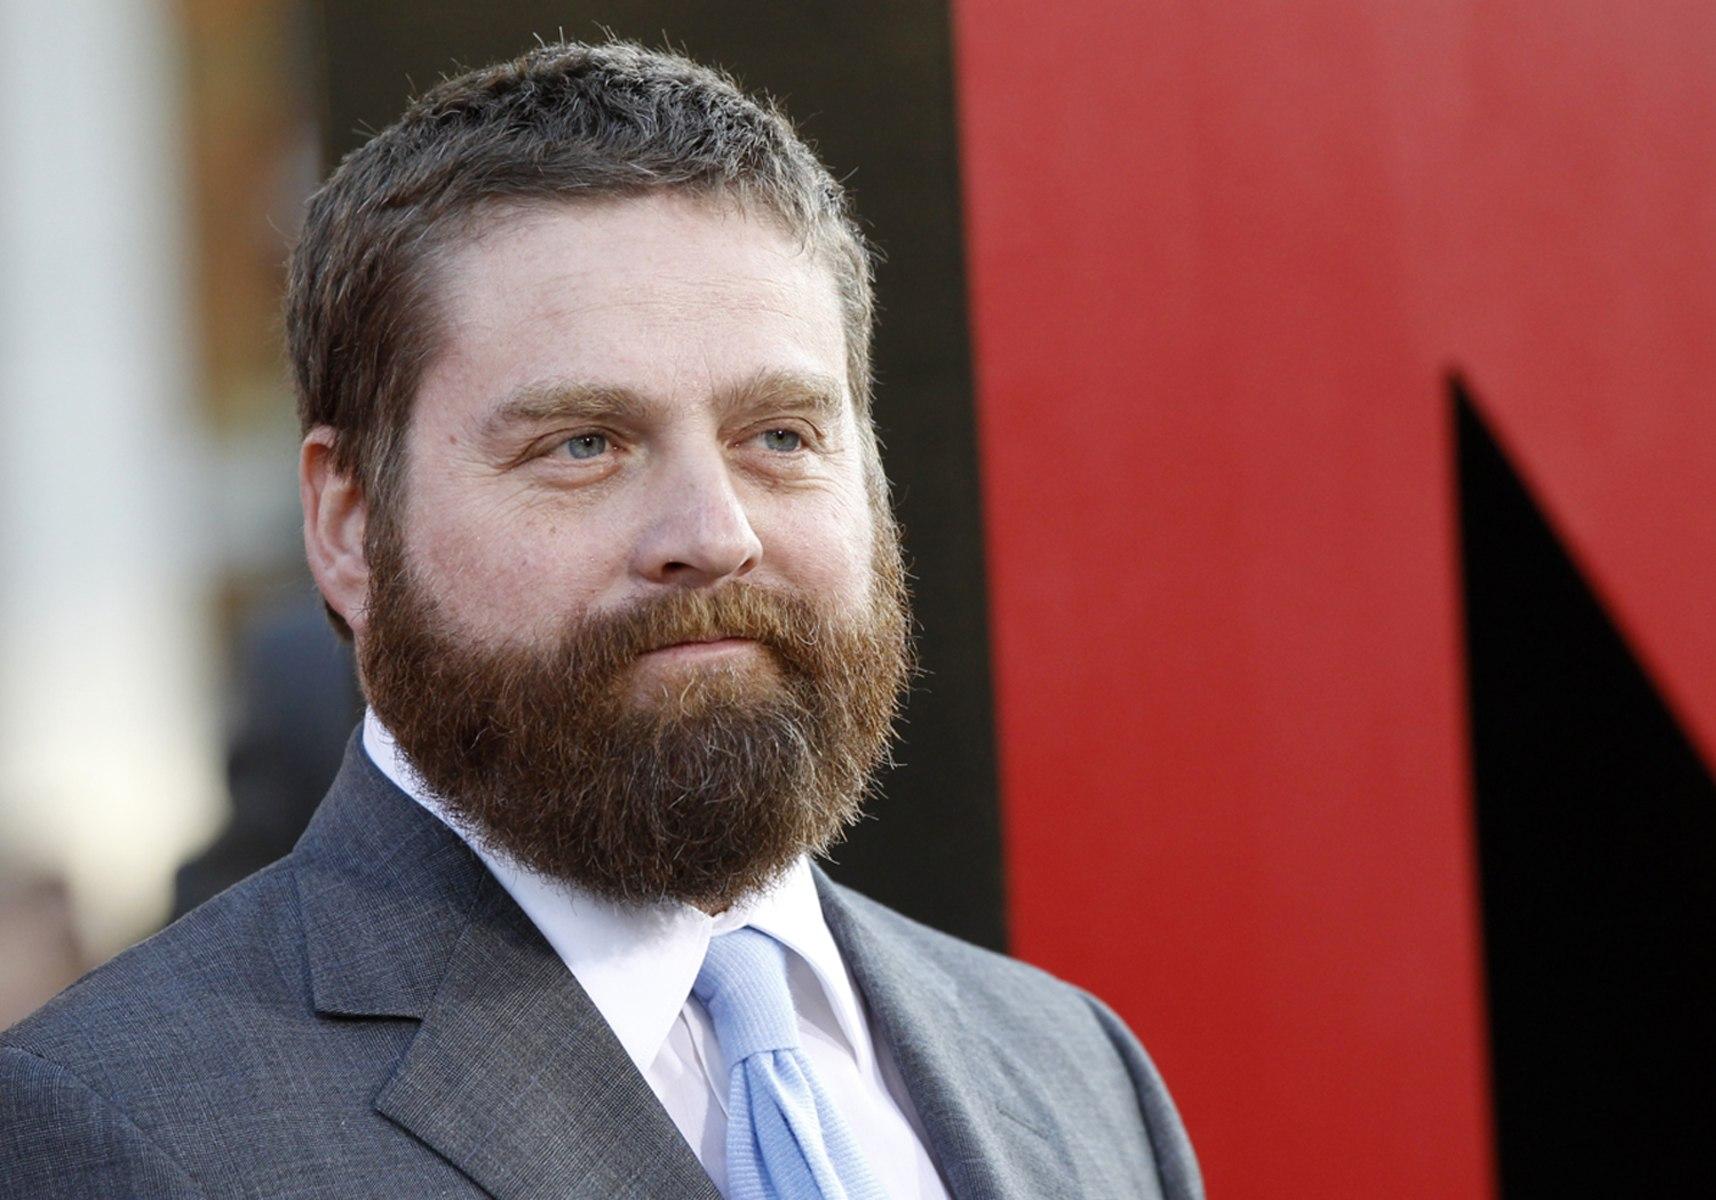 Tremendous Beard Envy Hipster Trend Sparks Interest In Facial Hair Hairstyles For Women Draintrainus